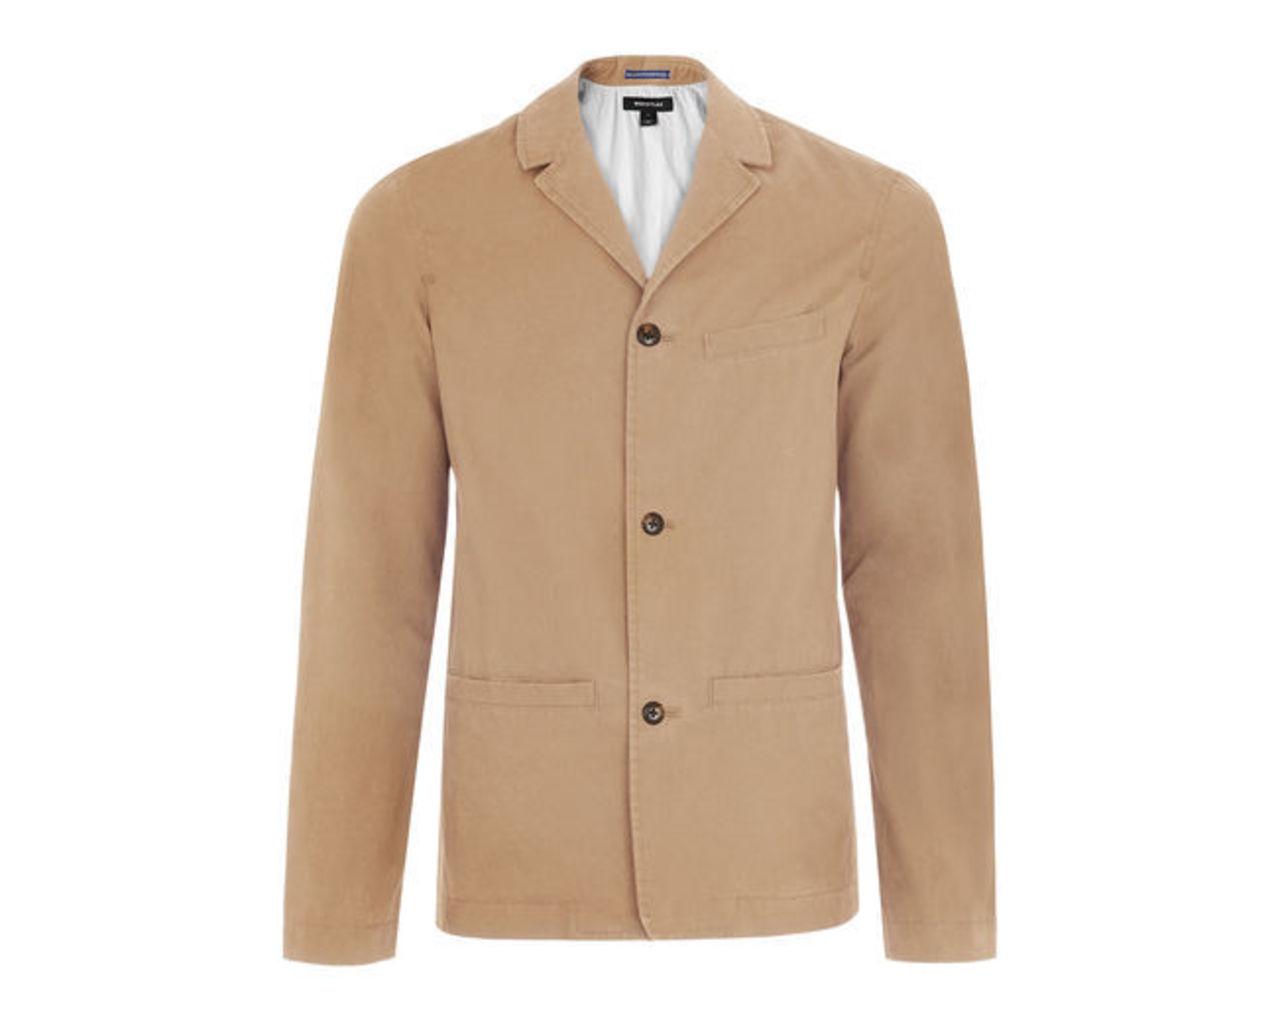 Deconstructed Cotton Jacket